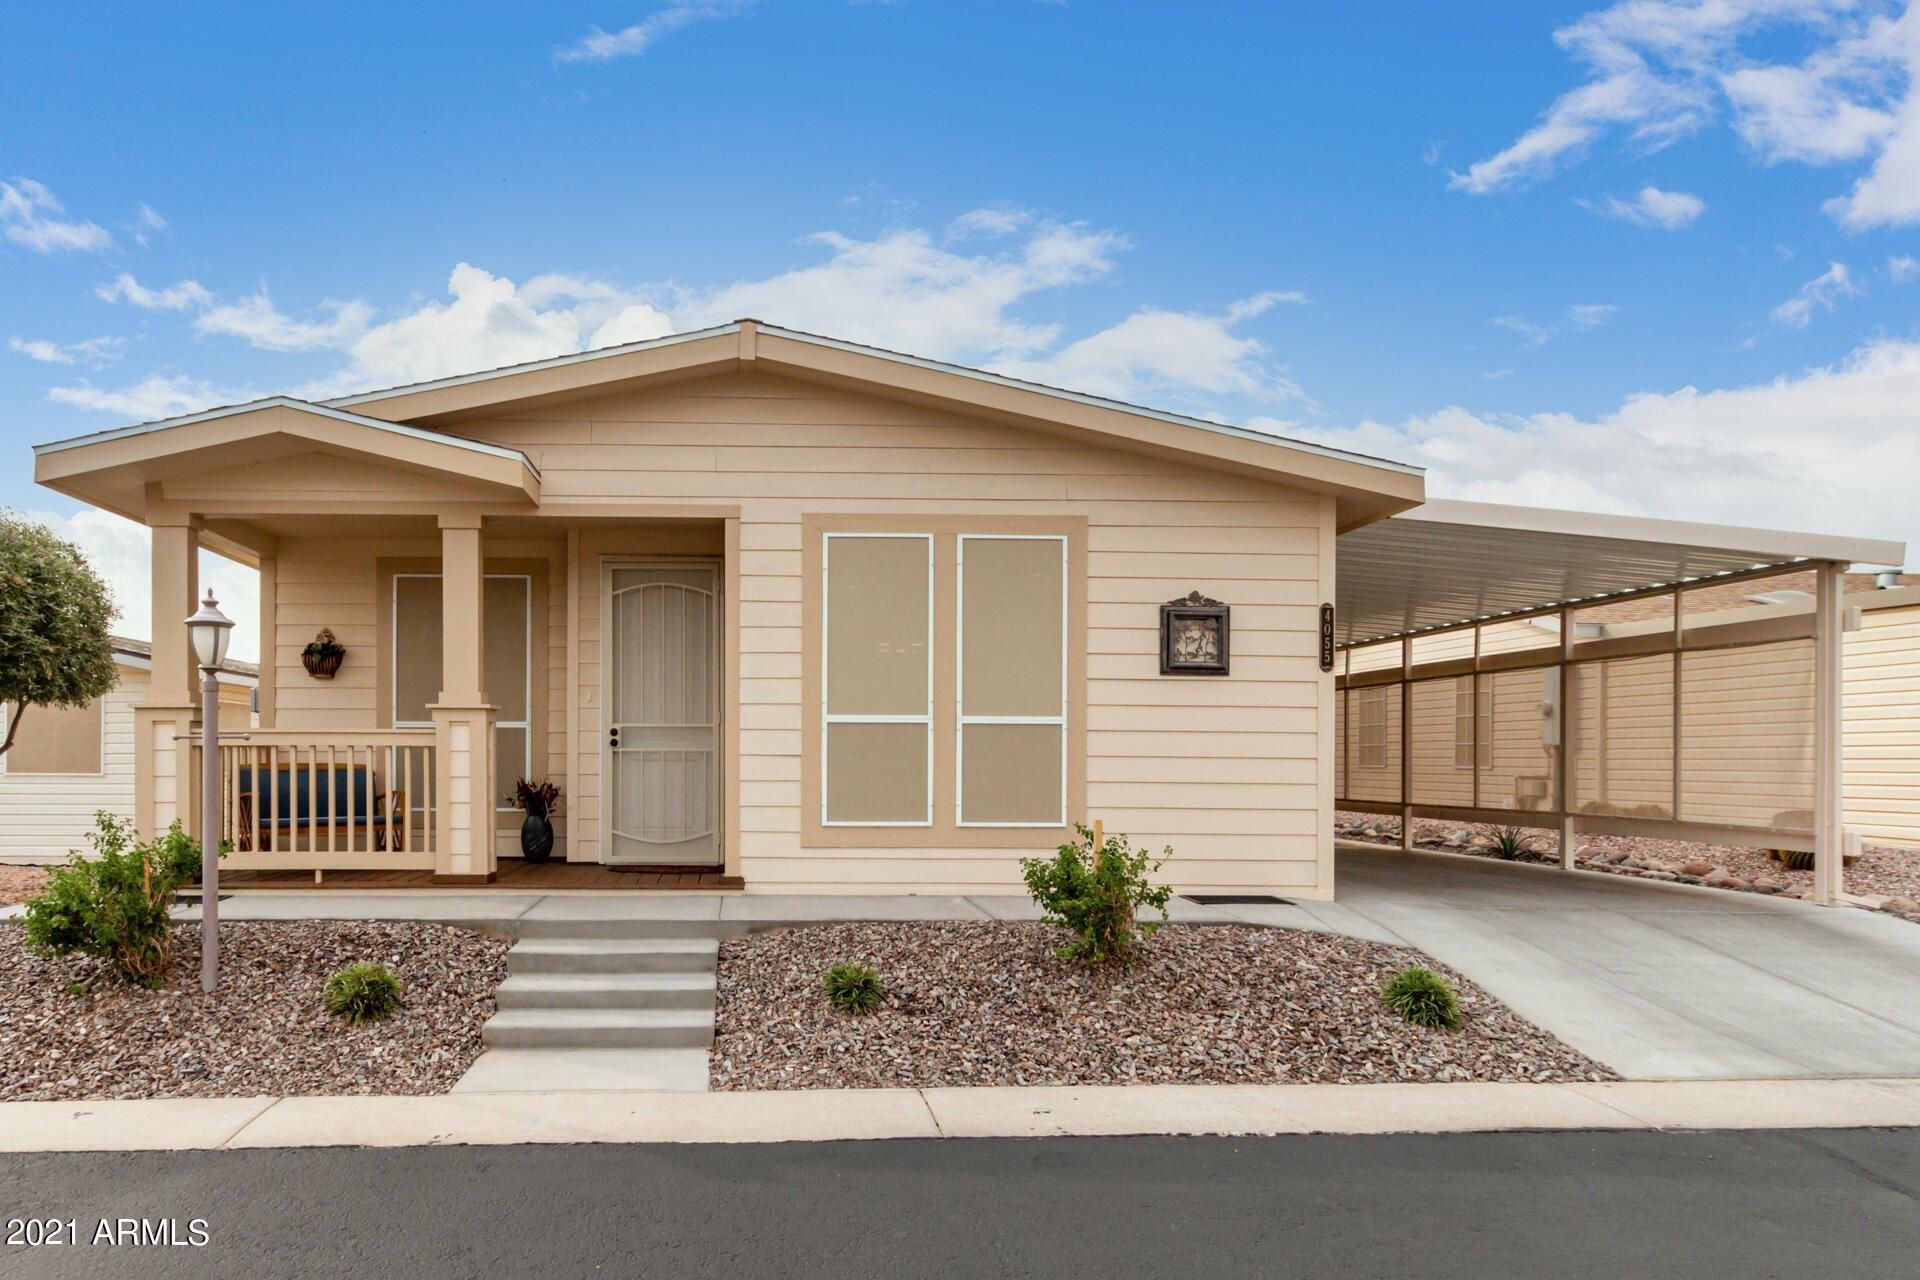 3301 S GOLDFIELD Road #4055, Apache Junction, AZ 85119 - #: 6268993